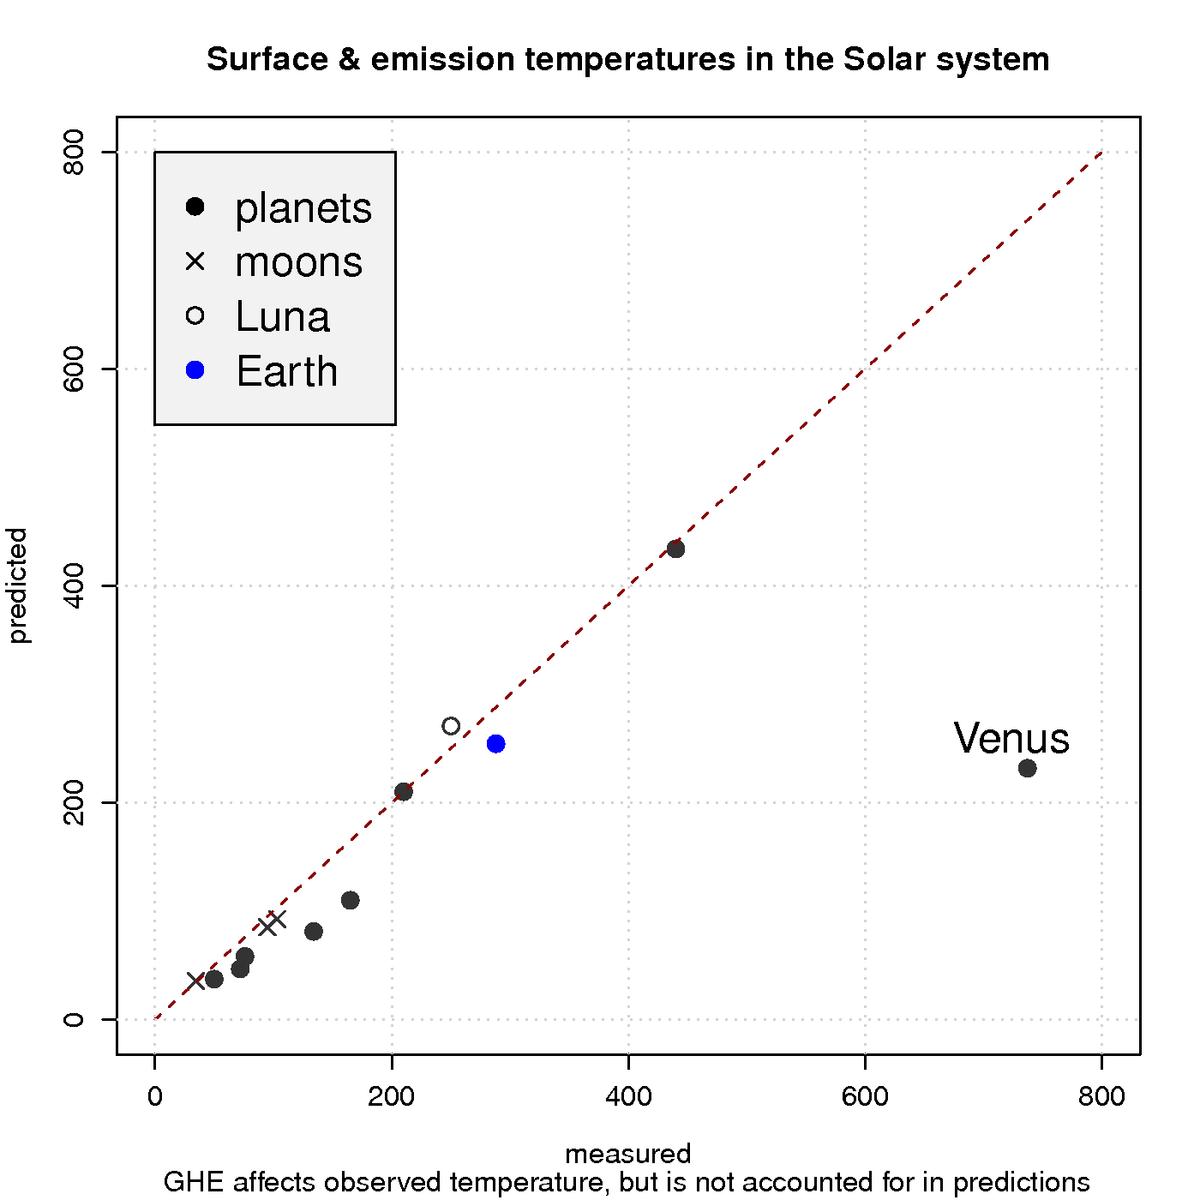 planetsinradiativebalance1.png